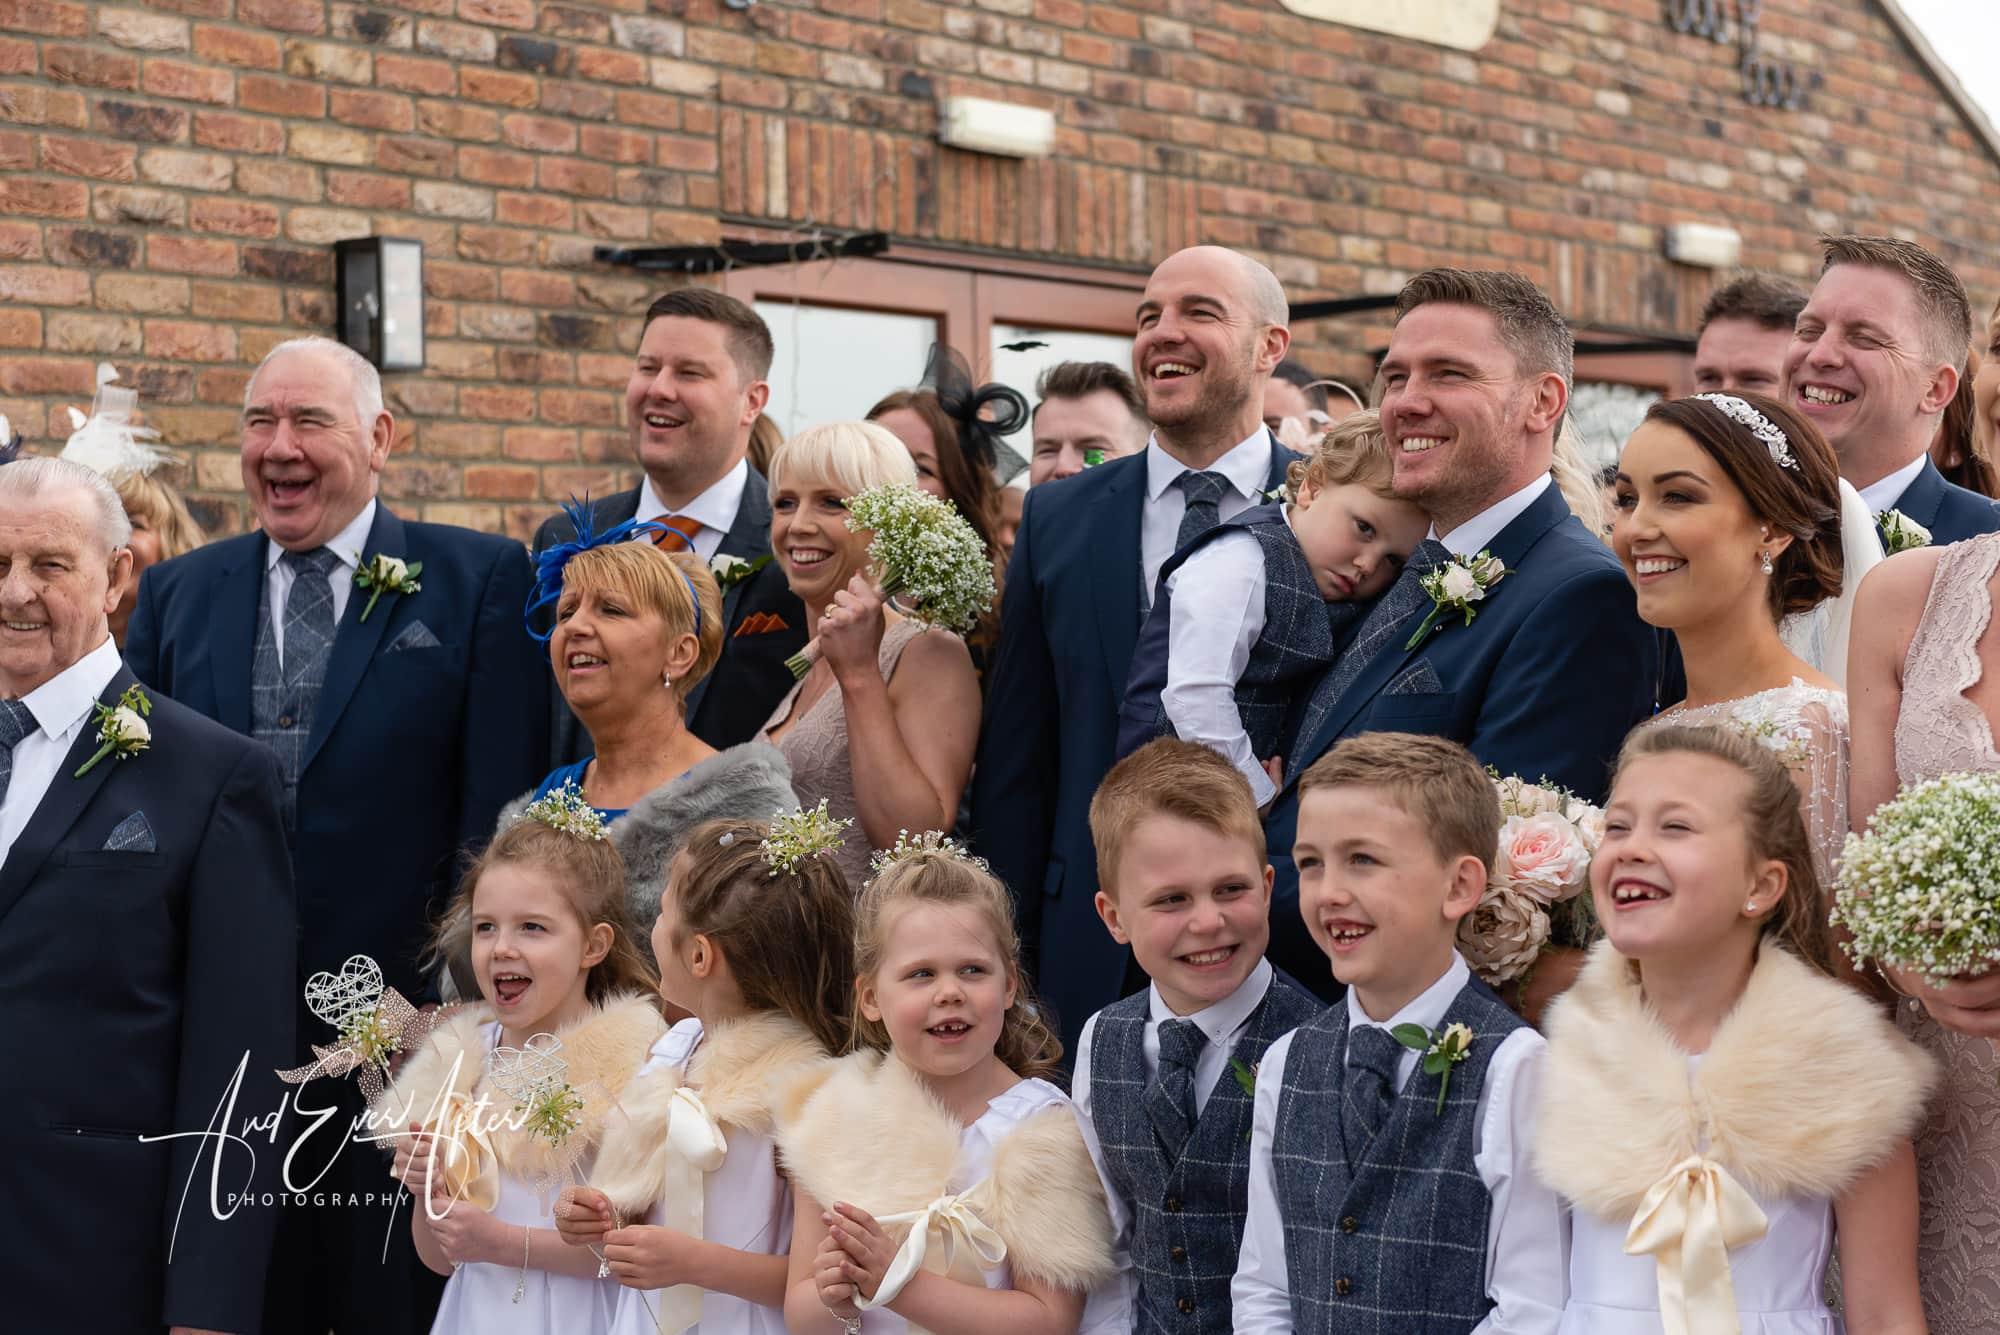 family wedding day photo